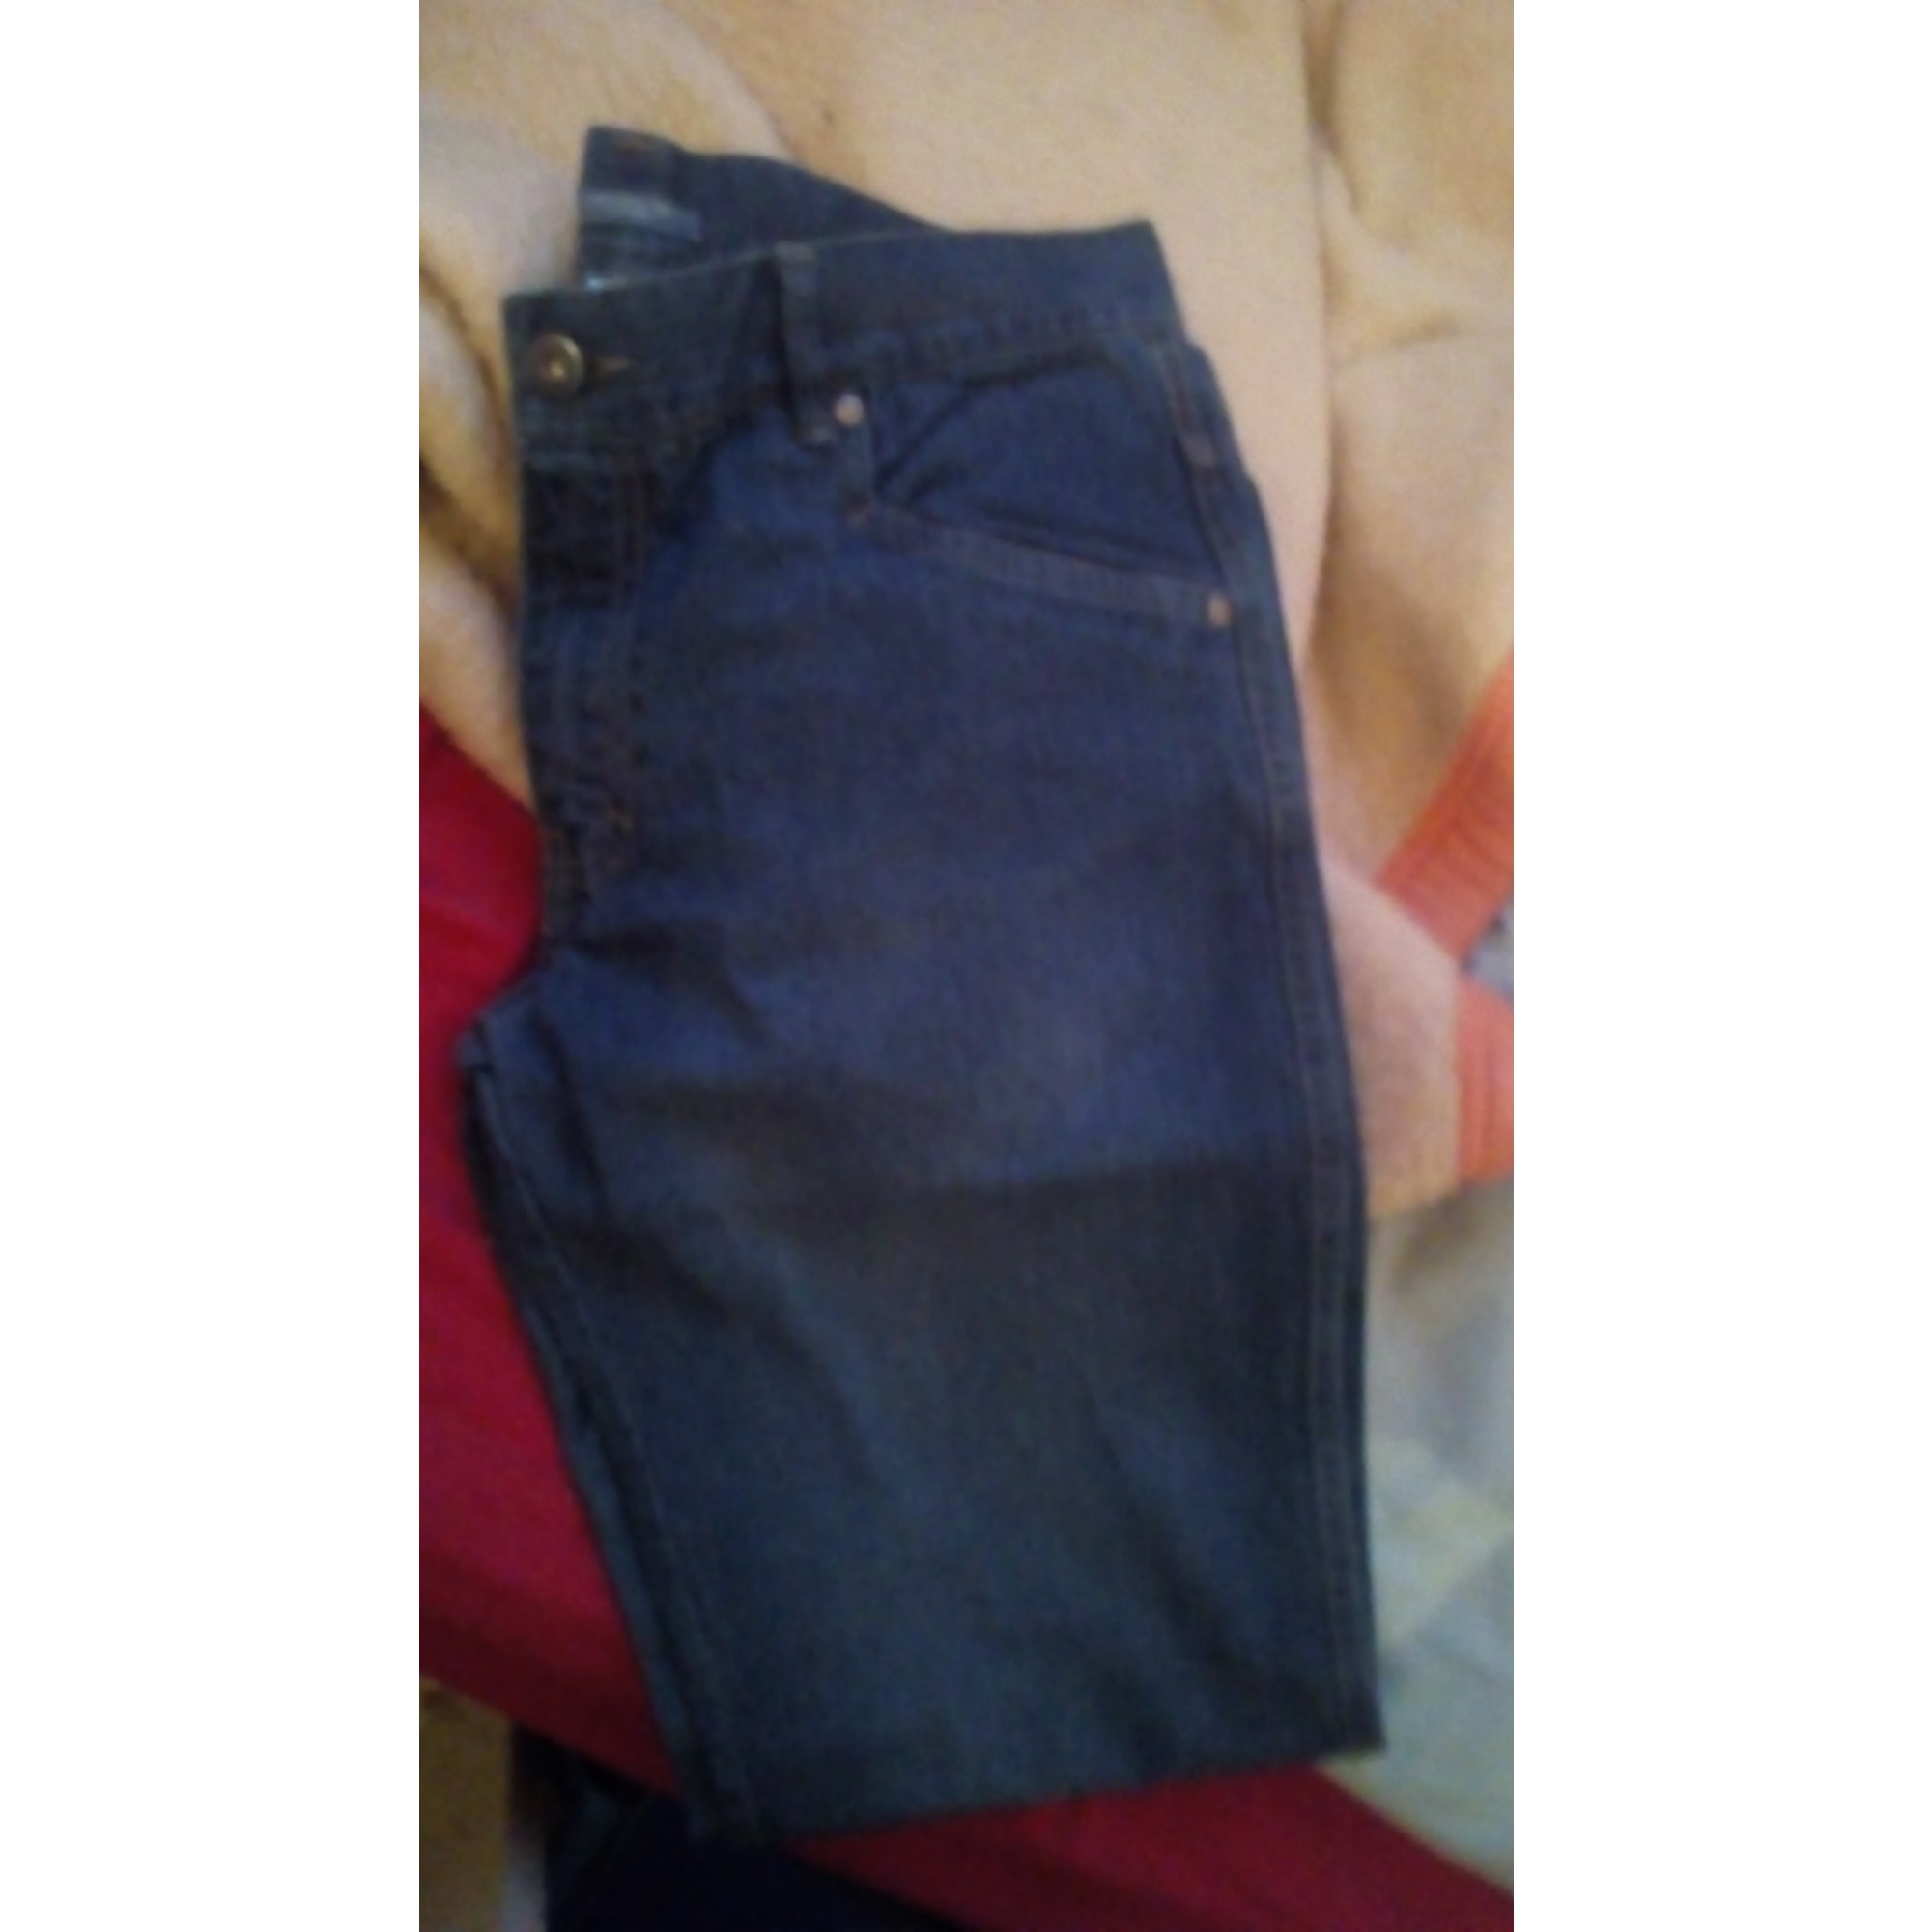 Jeans droit LA REDOUTE Bleu, bleu marine, bleu turquoise